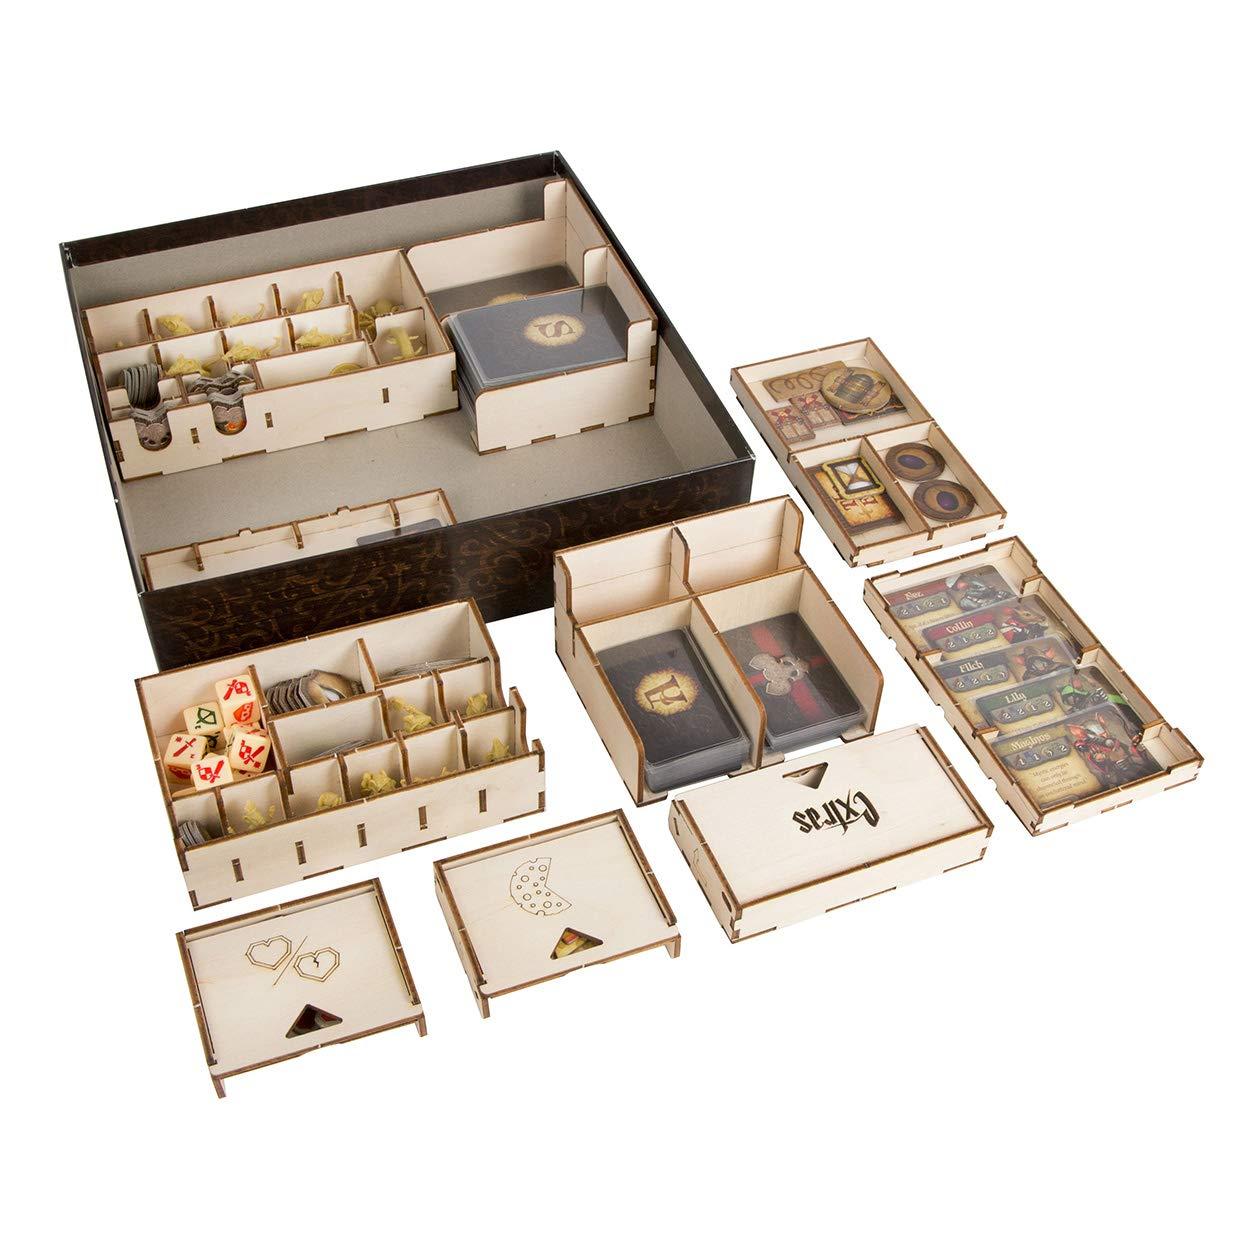 The Broken Token Box Organizer for Mice and Mystics